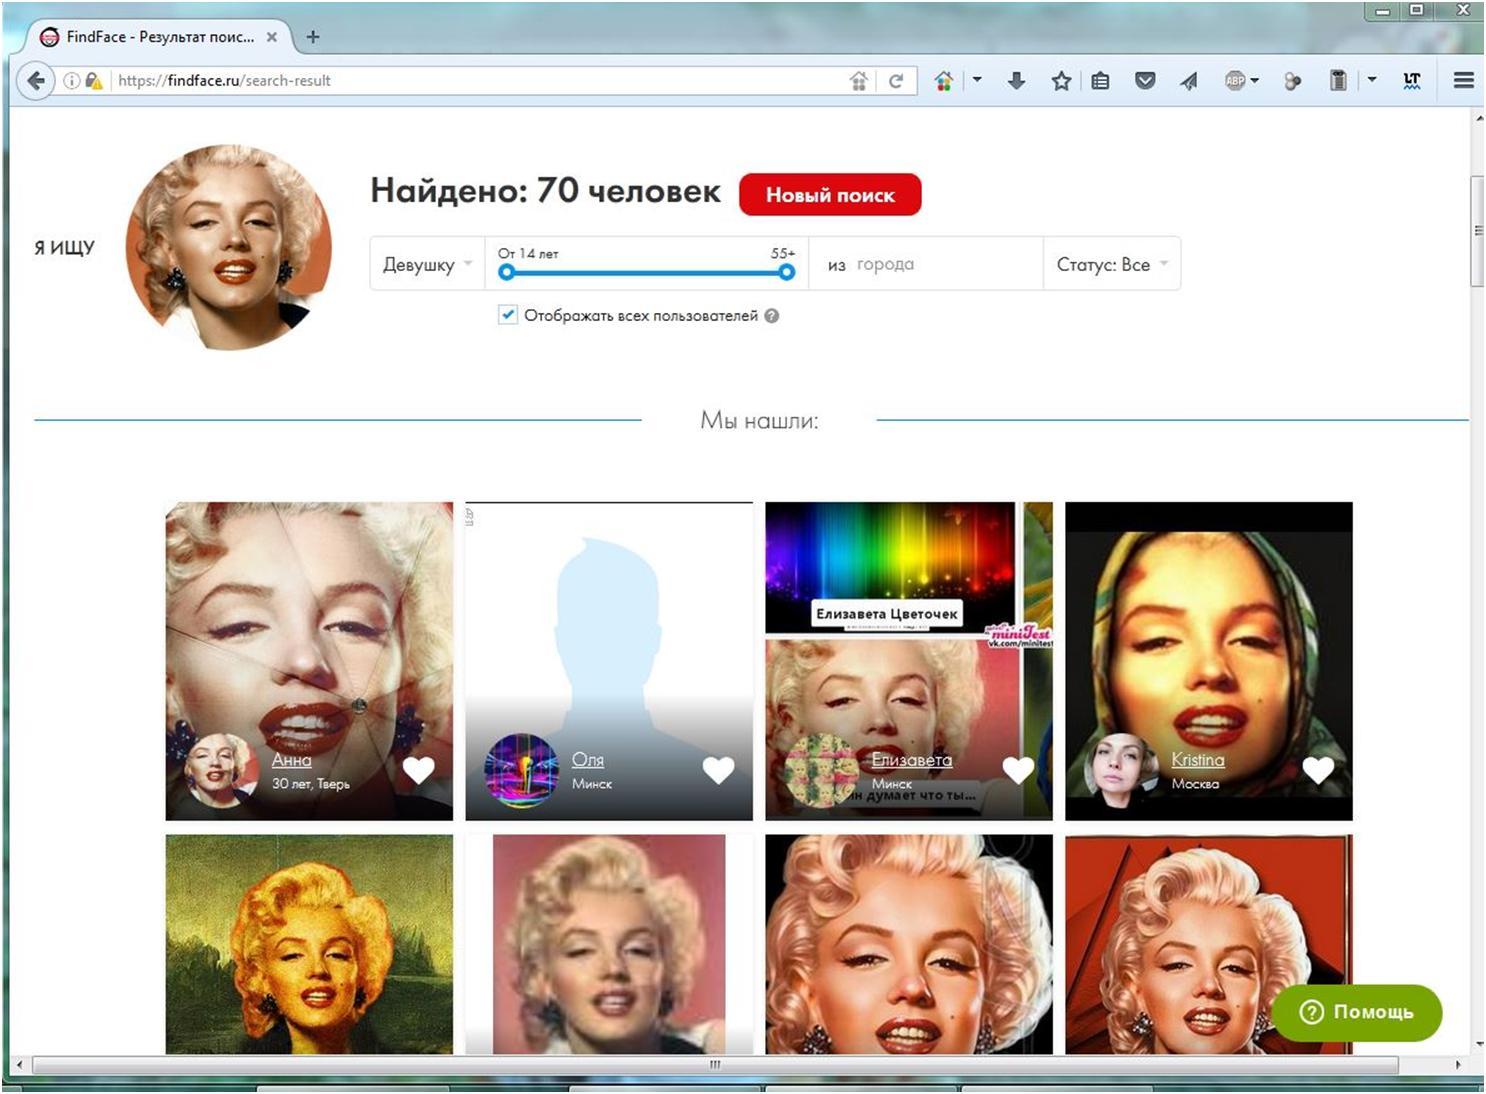 Скриншот сайта Findface с результатами поиска